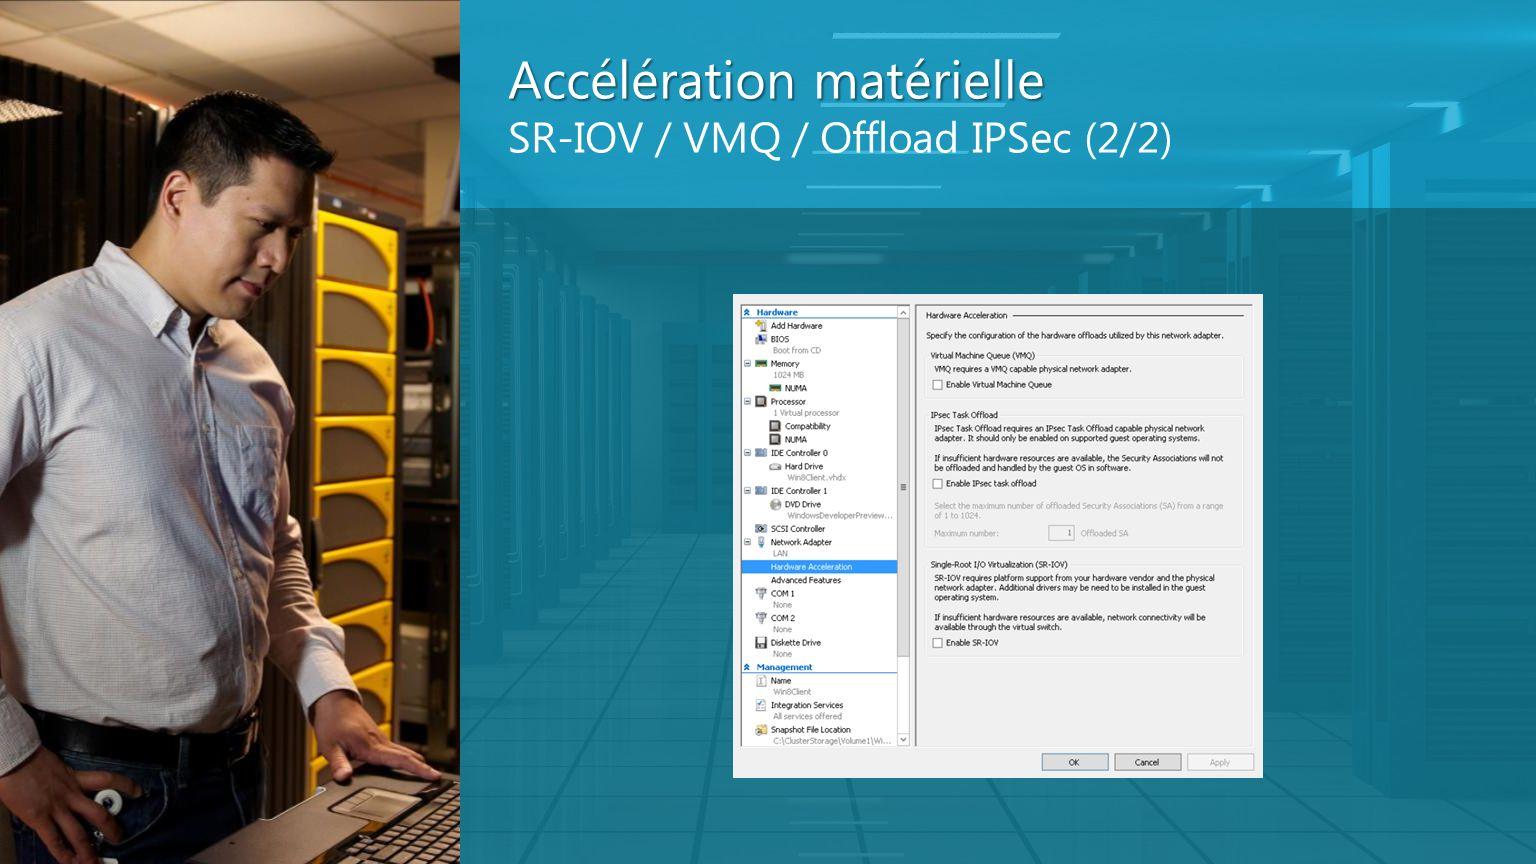 Accélération matérielle SR-IOV / VMQ / Offload IPSec (2/2)